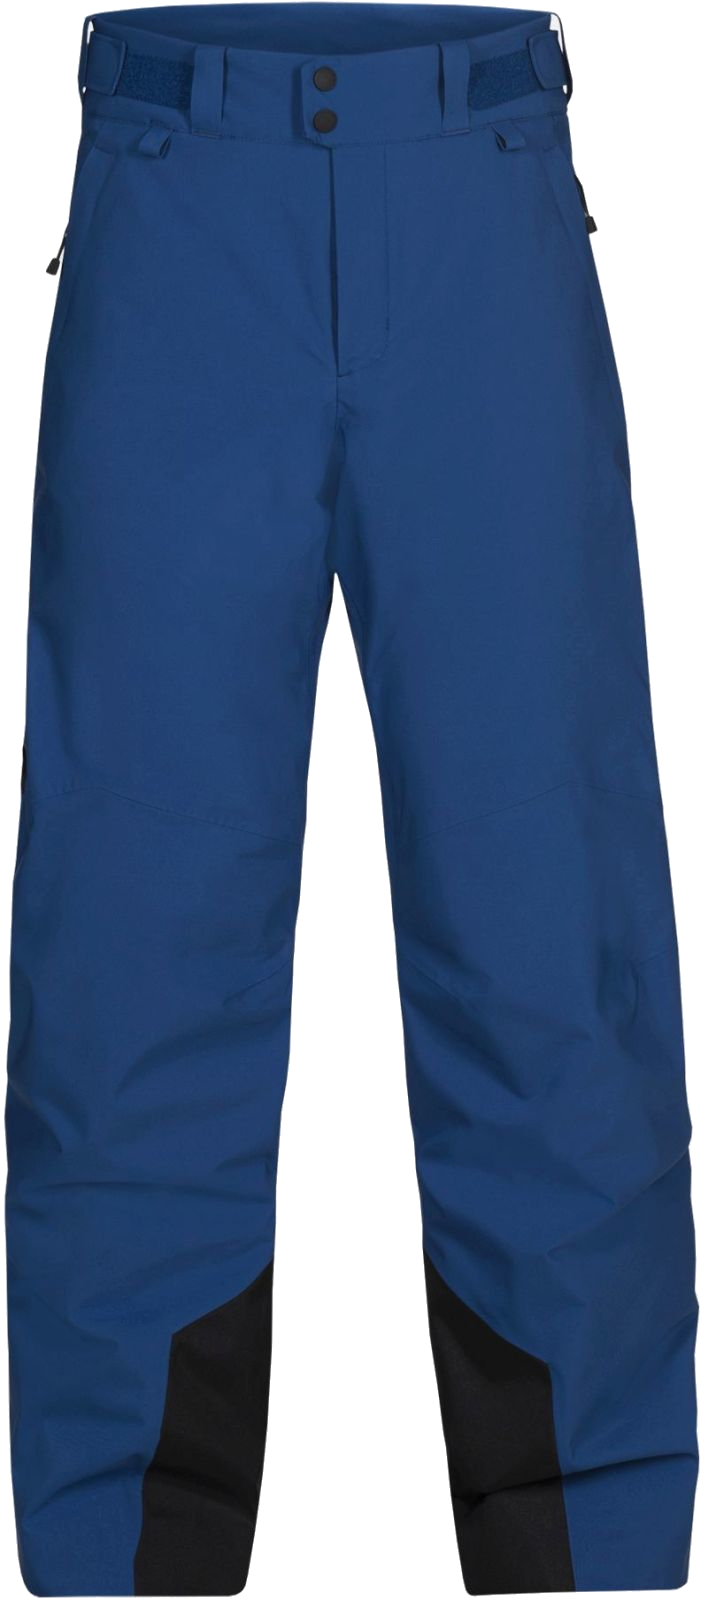 Peak Performance Maroon Pants - True Blue XXL